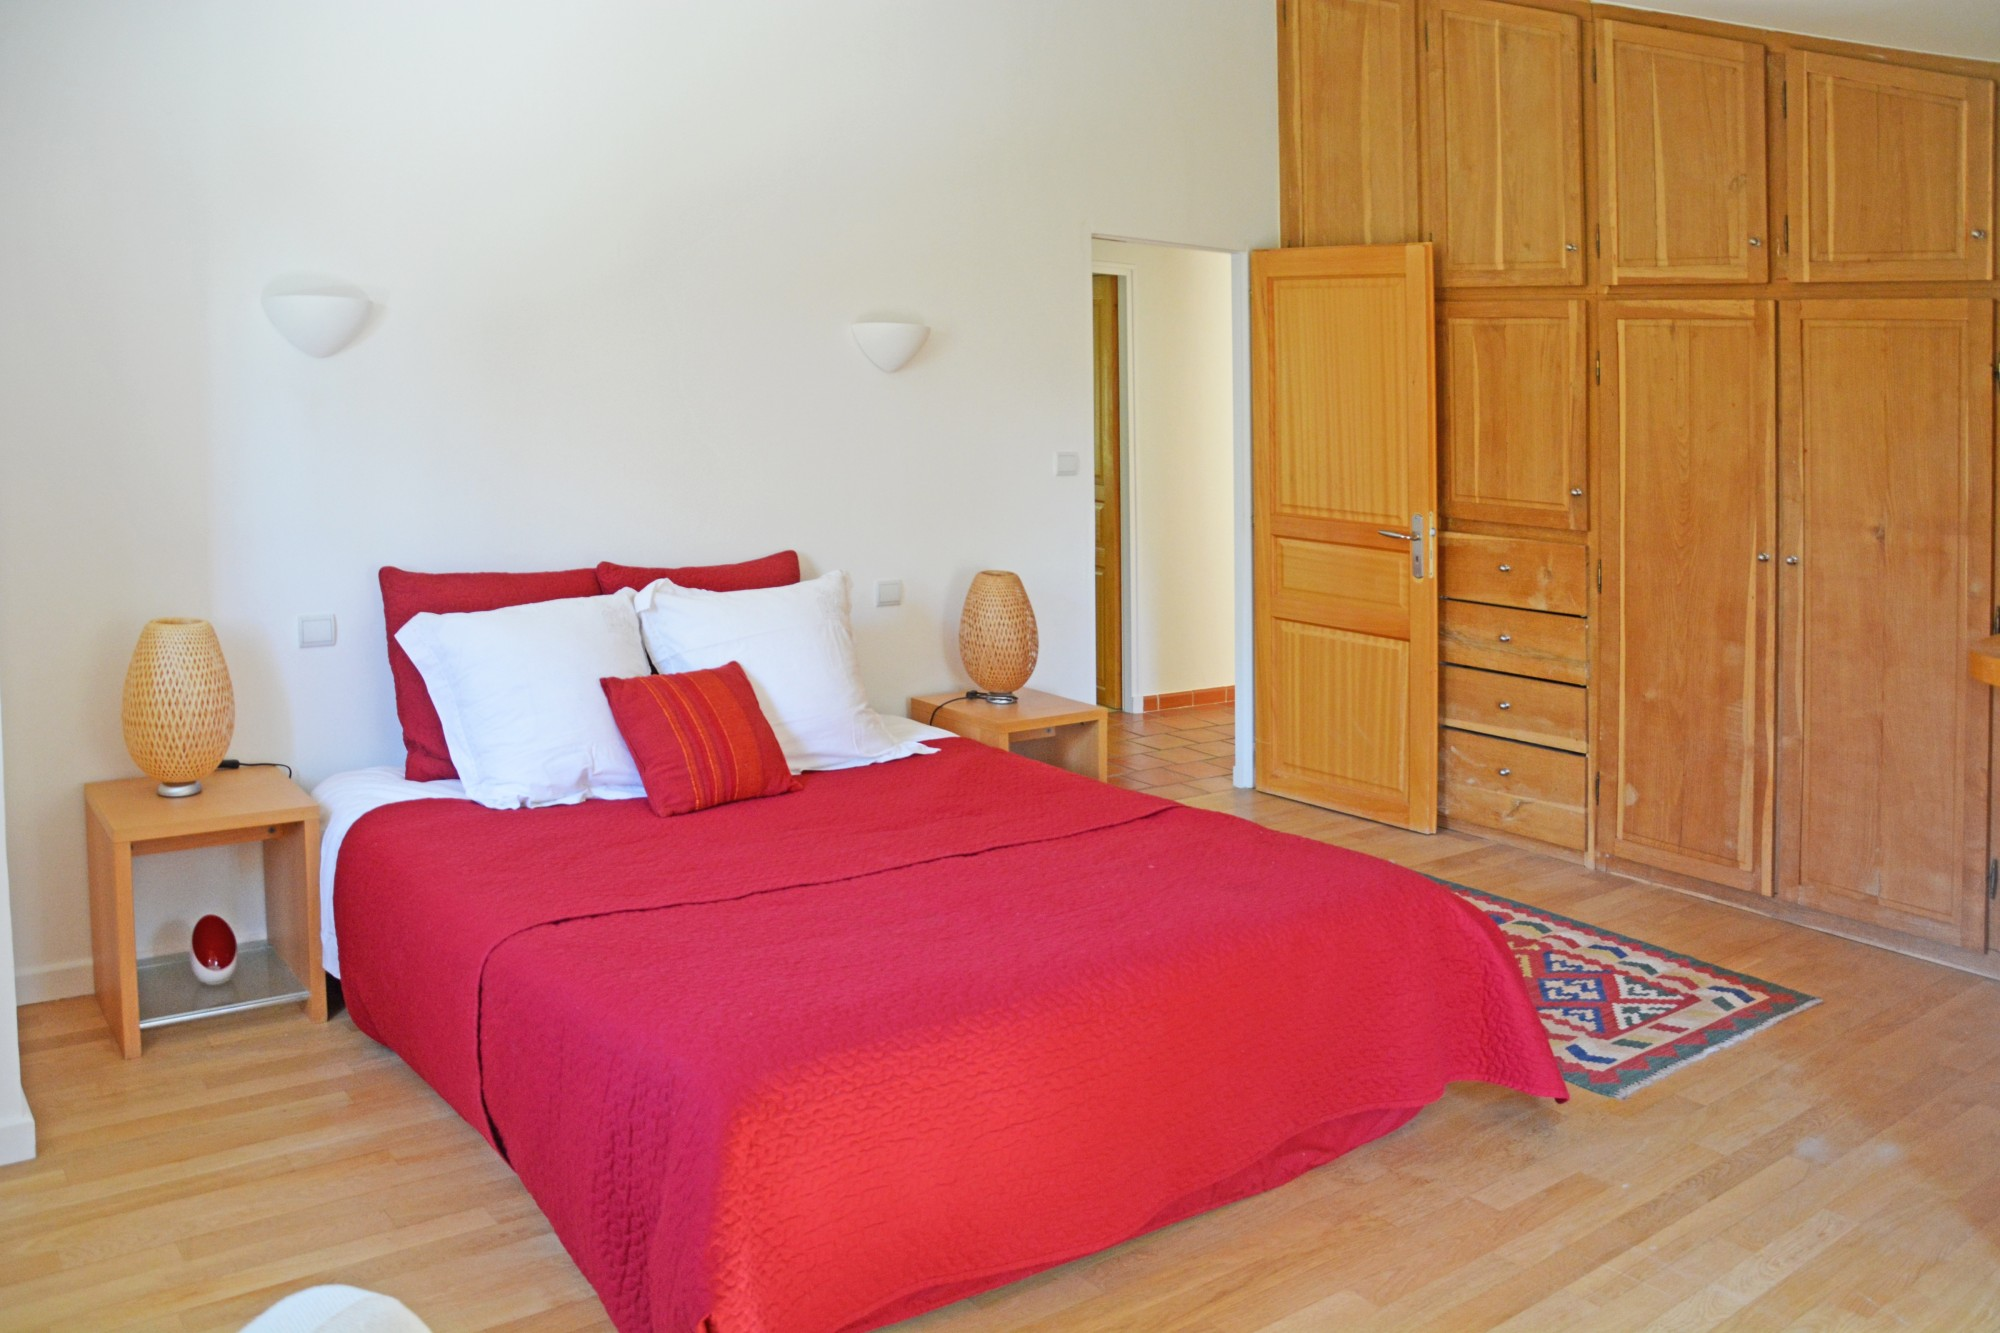 Maison 5 chambres a louer elegant maison 5 chambres a for Site location chambre